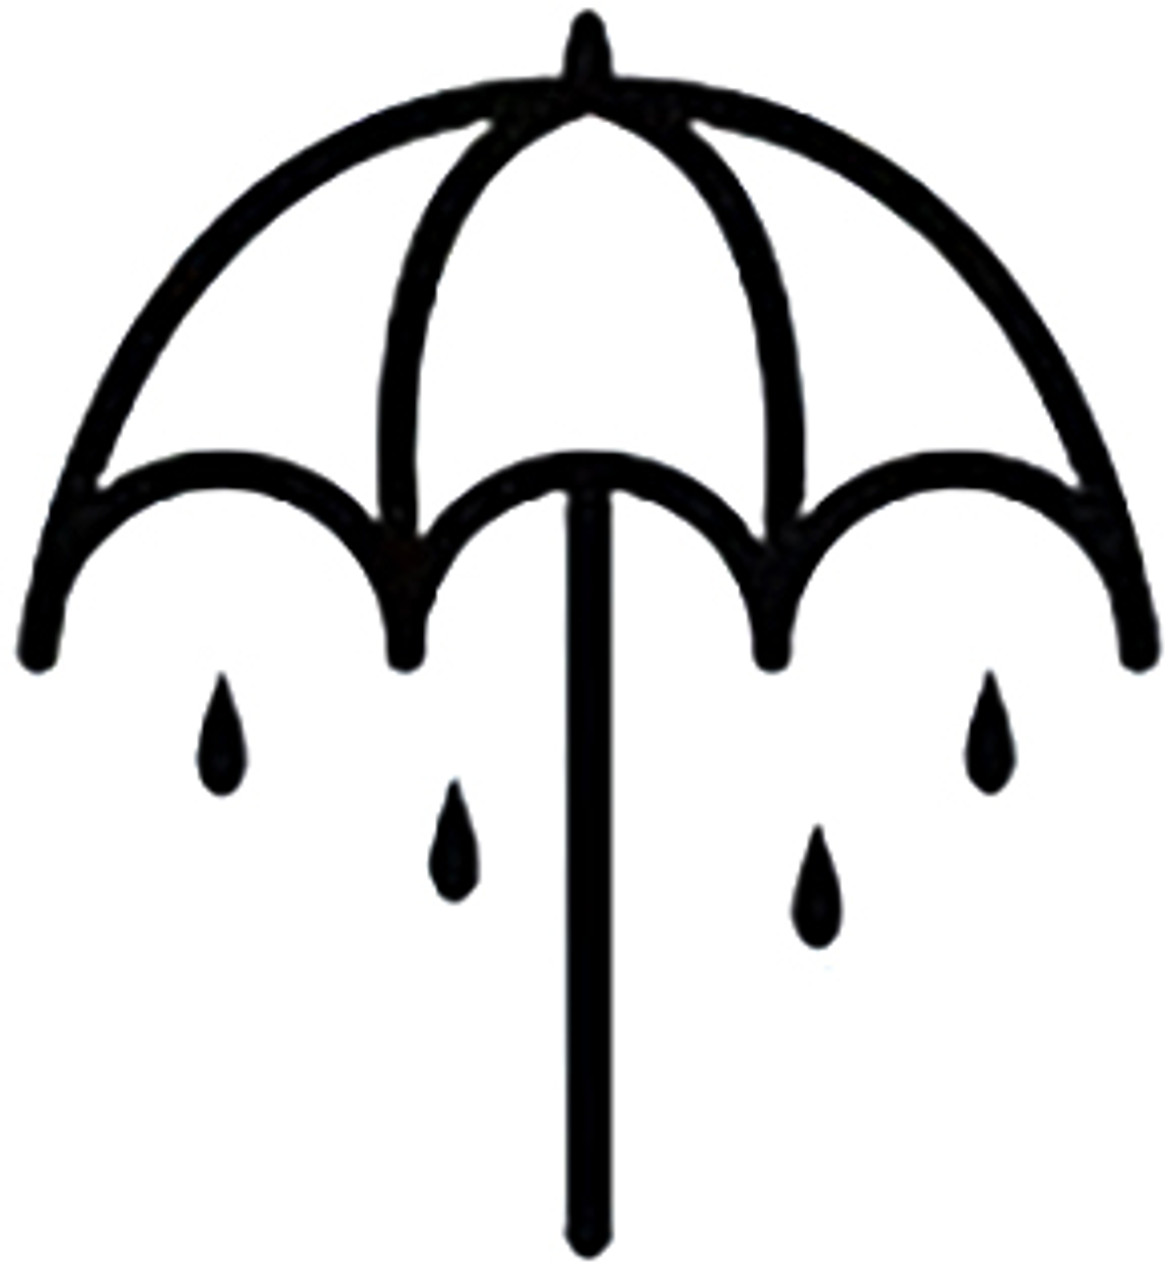 BRING ME THE HORIZON UMBRELLA Band Logo DecalUpc Horizon Logo